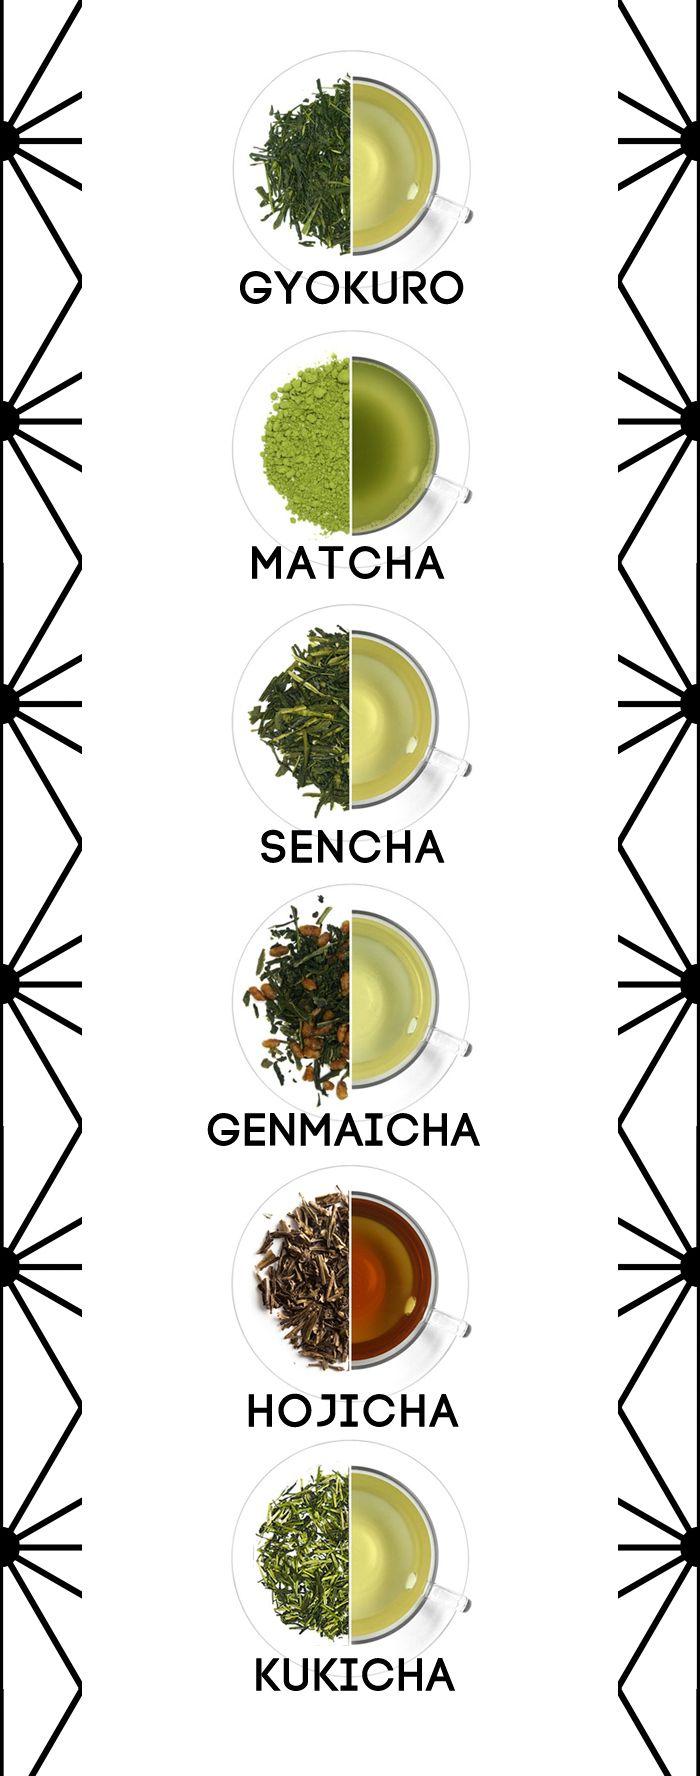 Japanese Green Tea Varieties by condospalillos #Infographic #Green_Tea #Japan